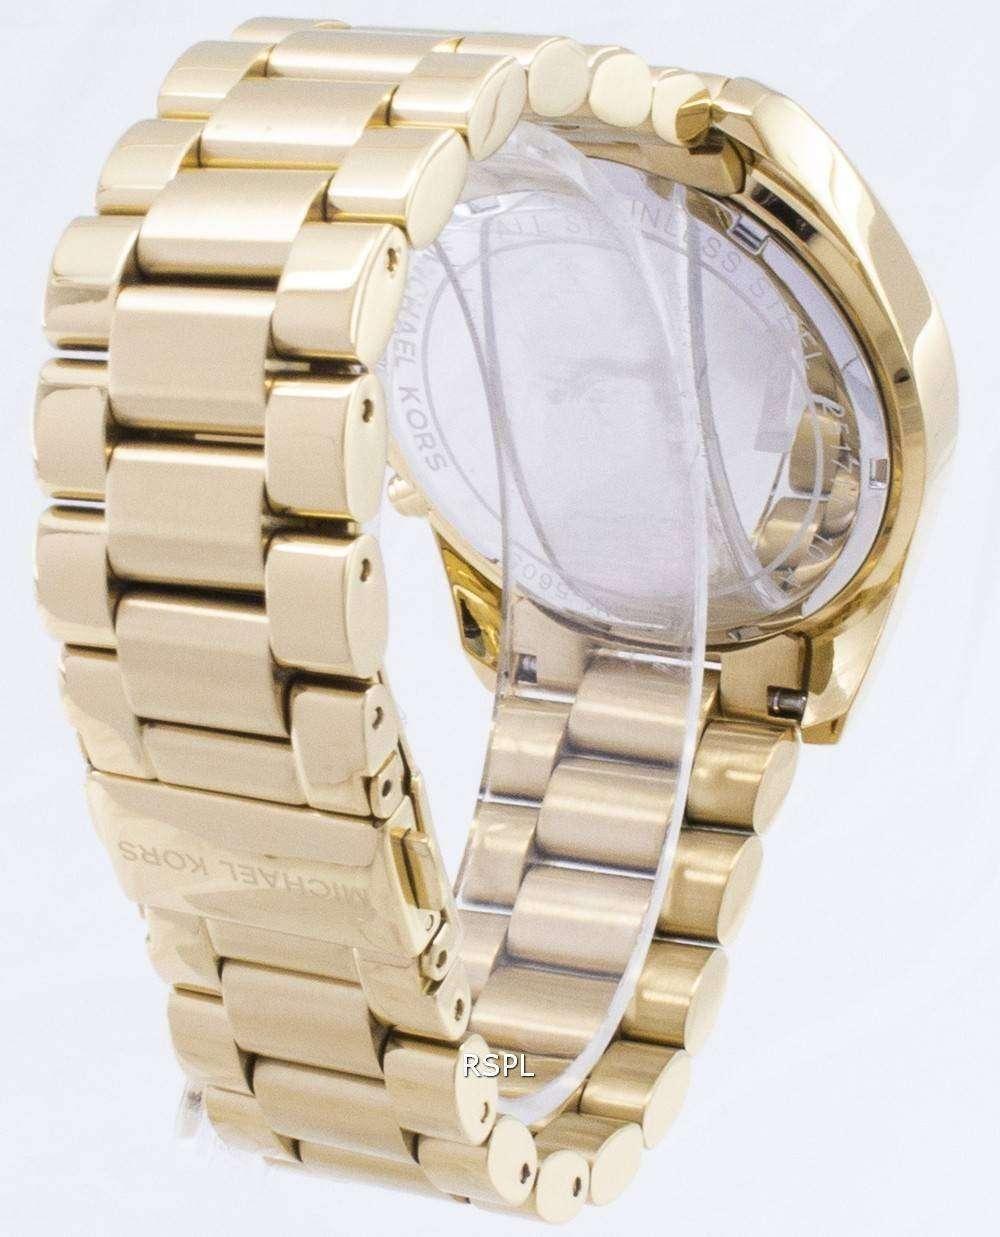 46fdfc3cc95d Michael Kors Bradshaw Chronograph Gold-Tone MK5605 Unisex Watch -  ZetaWatches